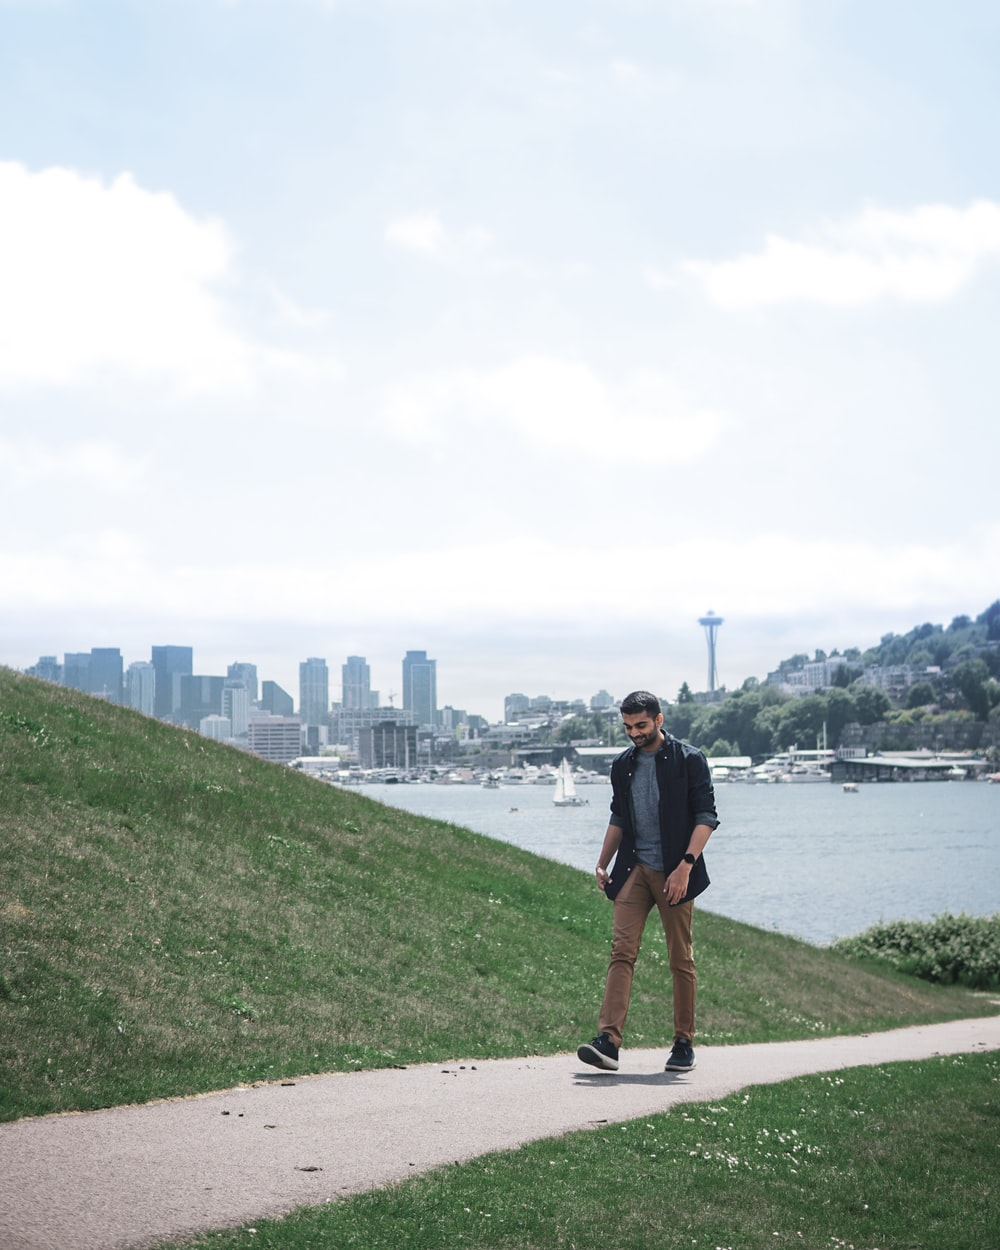 man in black t-shirt and black shorts standing on gray concrete pavement near body of near near near near